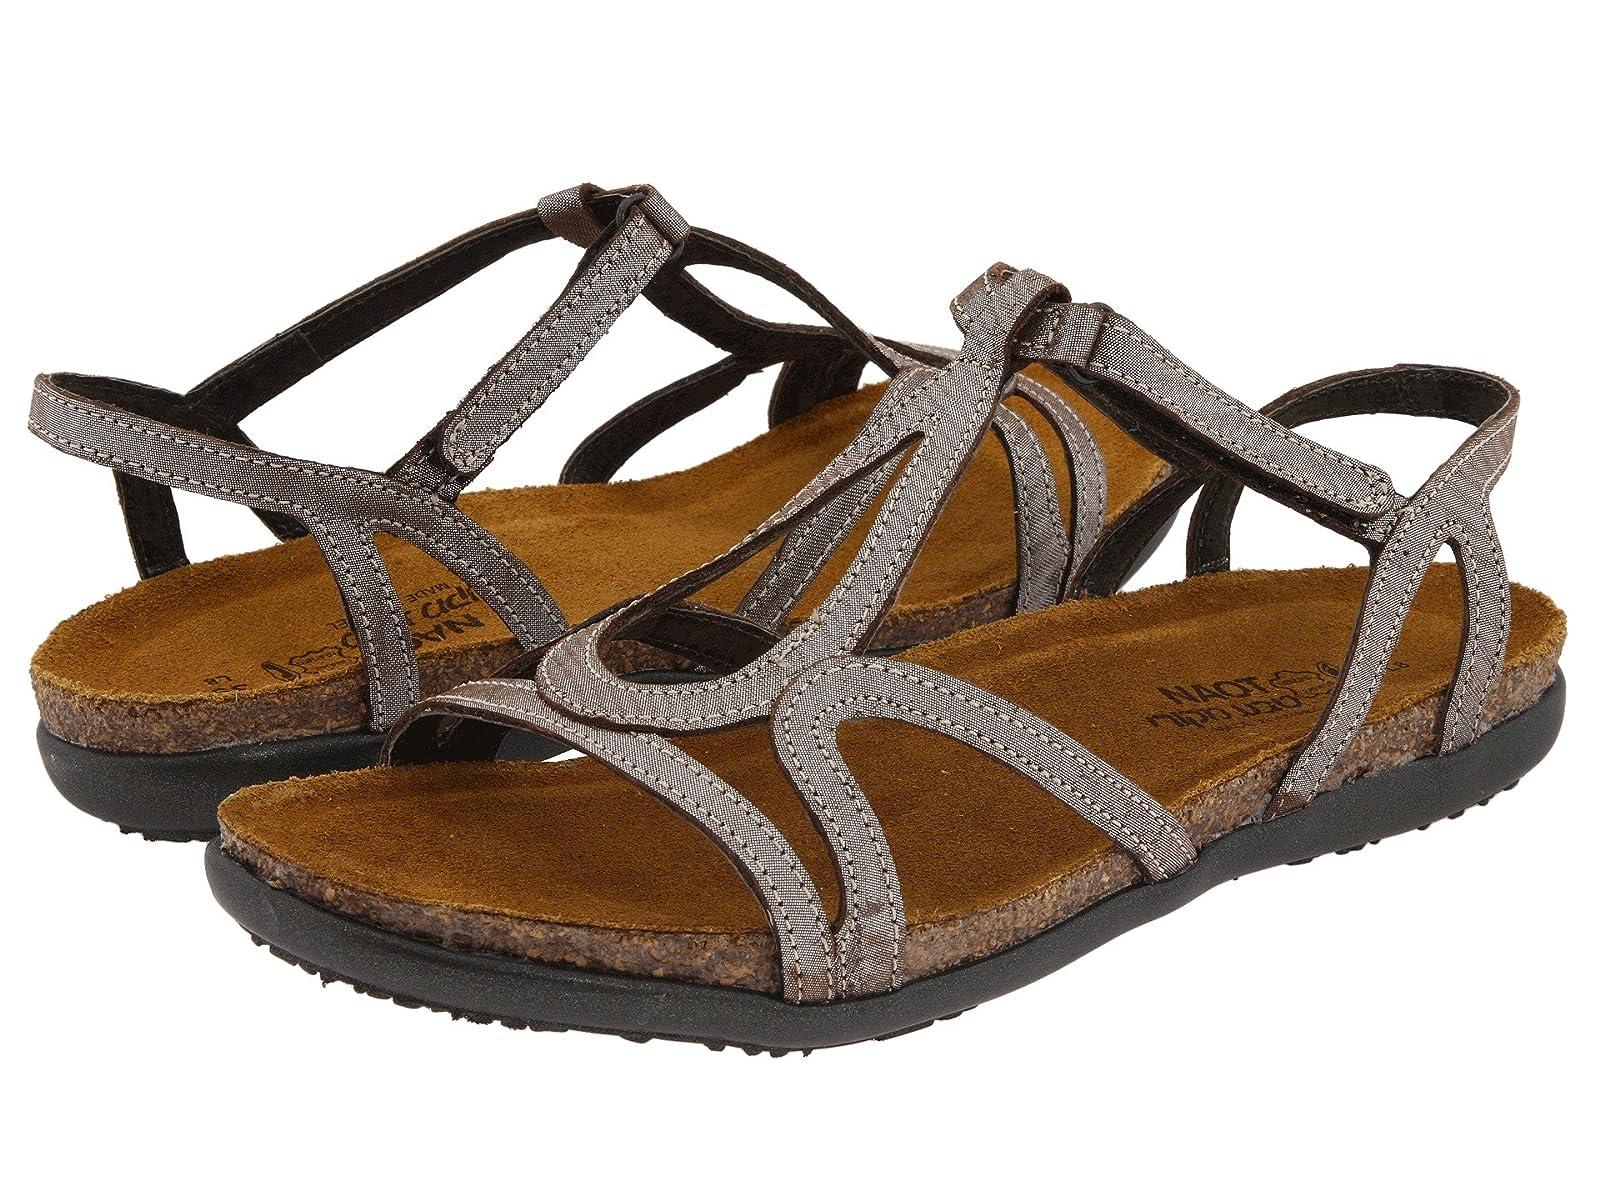 Naot DorithAtmospheric grades have affordable shoes